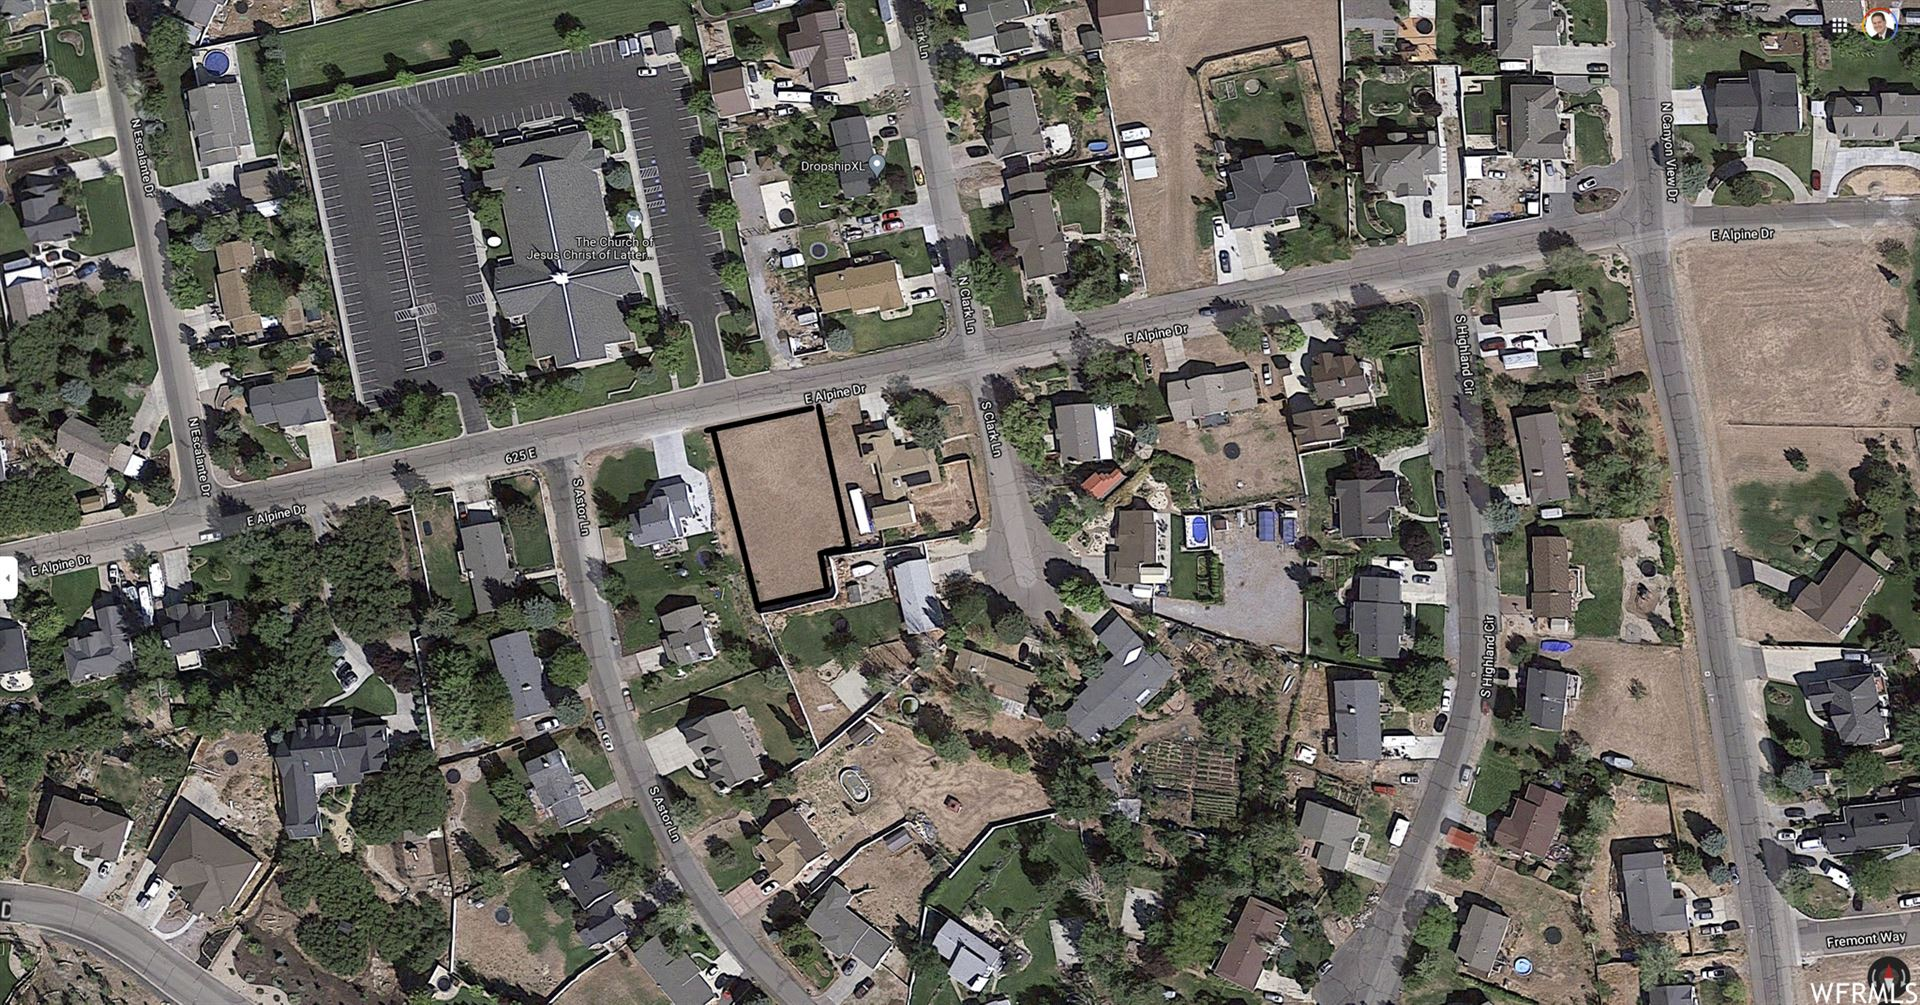 Photo of 346 E ALPINE N DR, Elk Ridge, UT 84651 (MLS # 1769893)